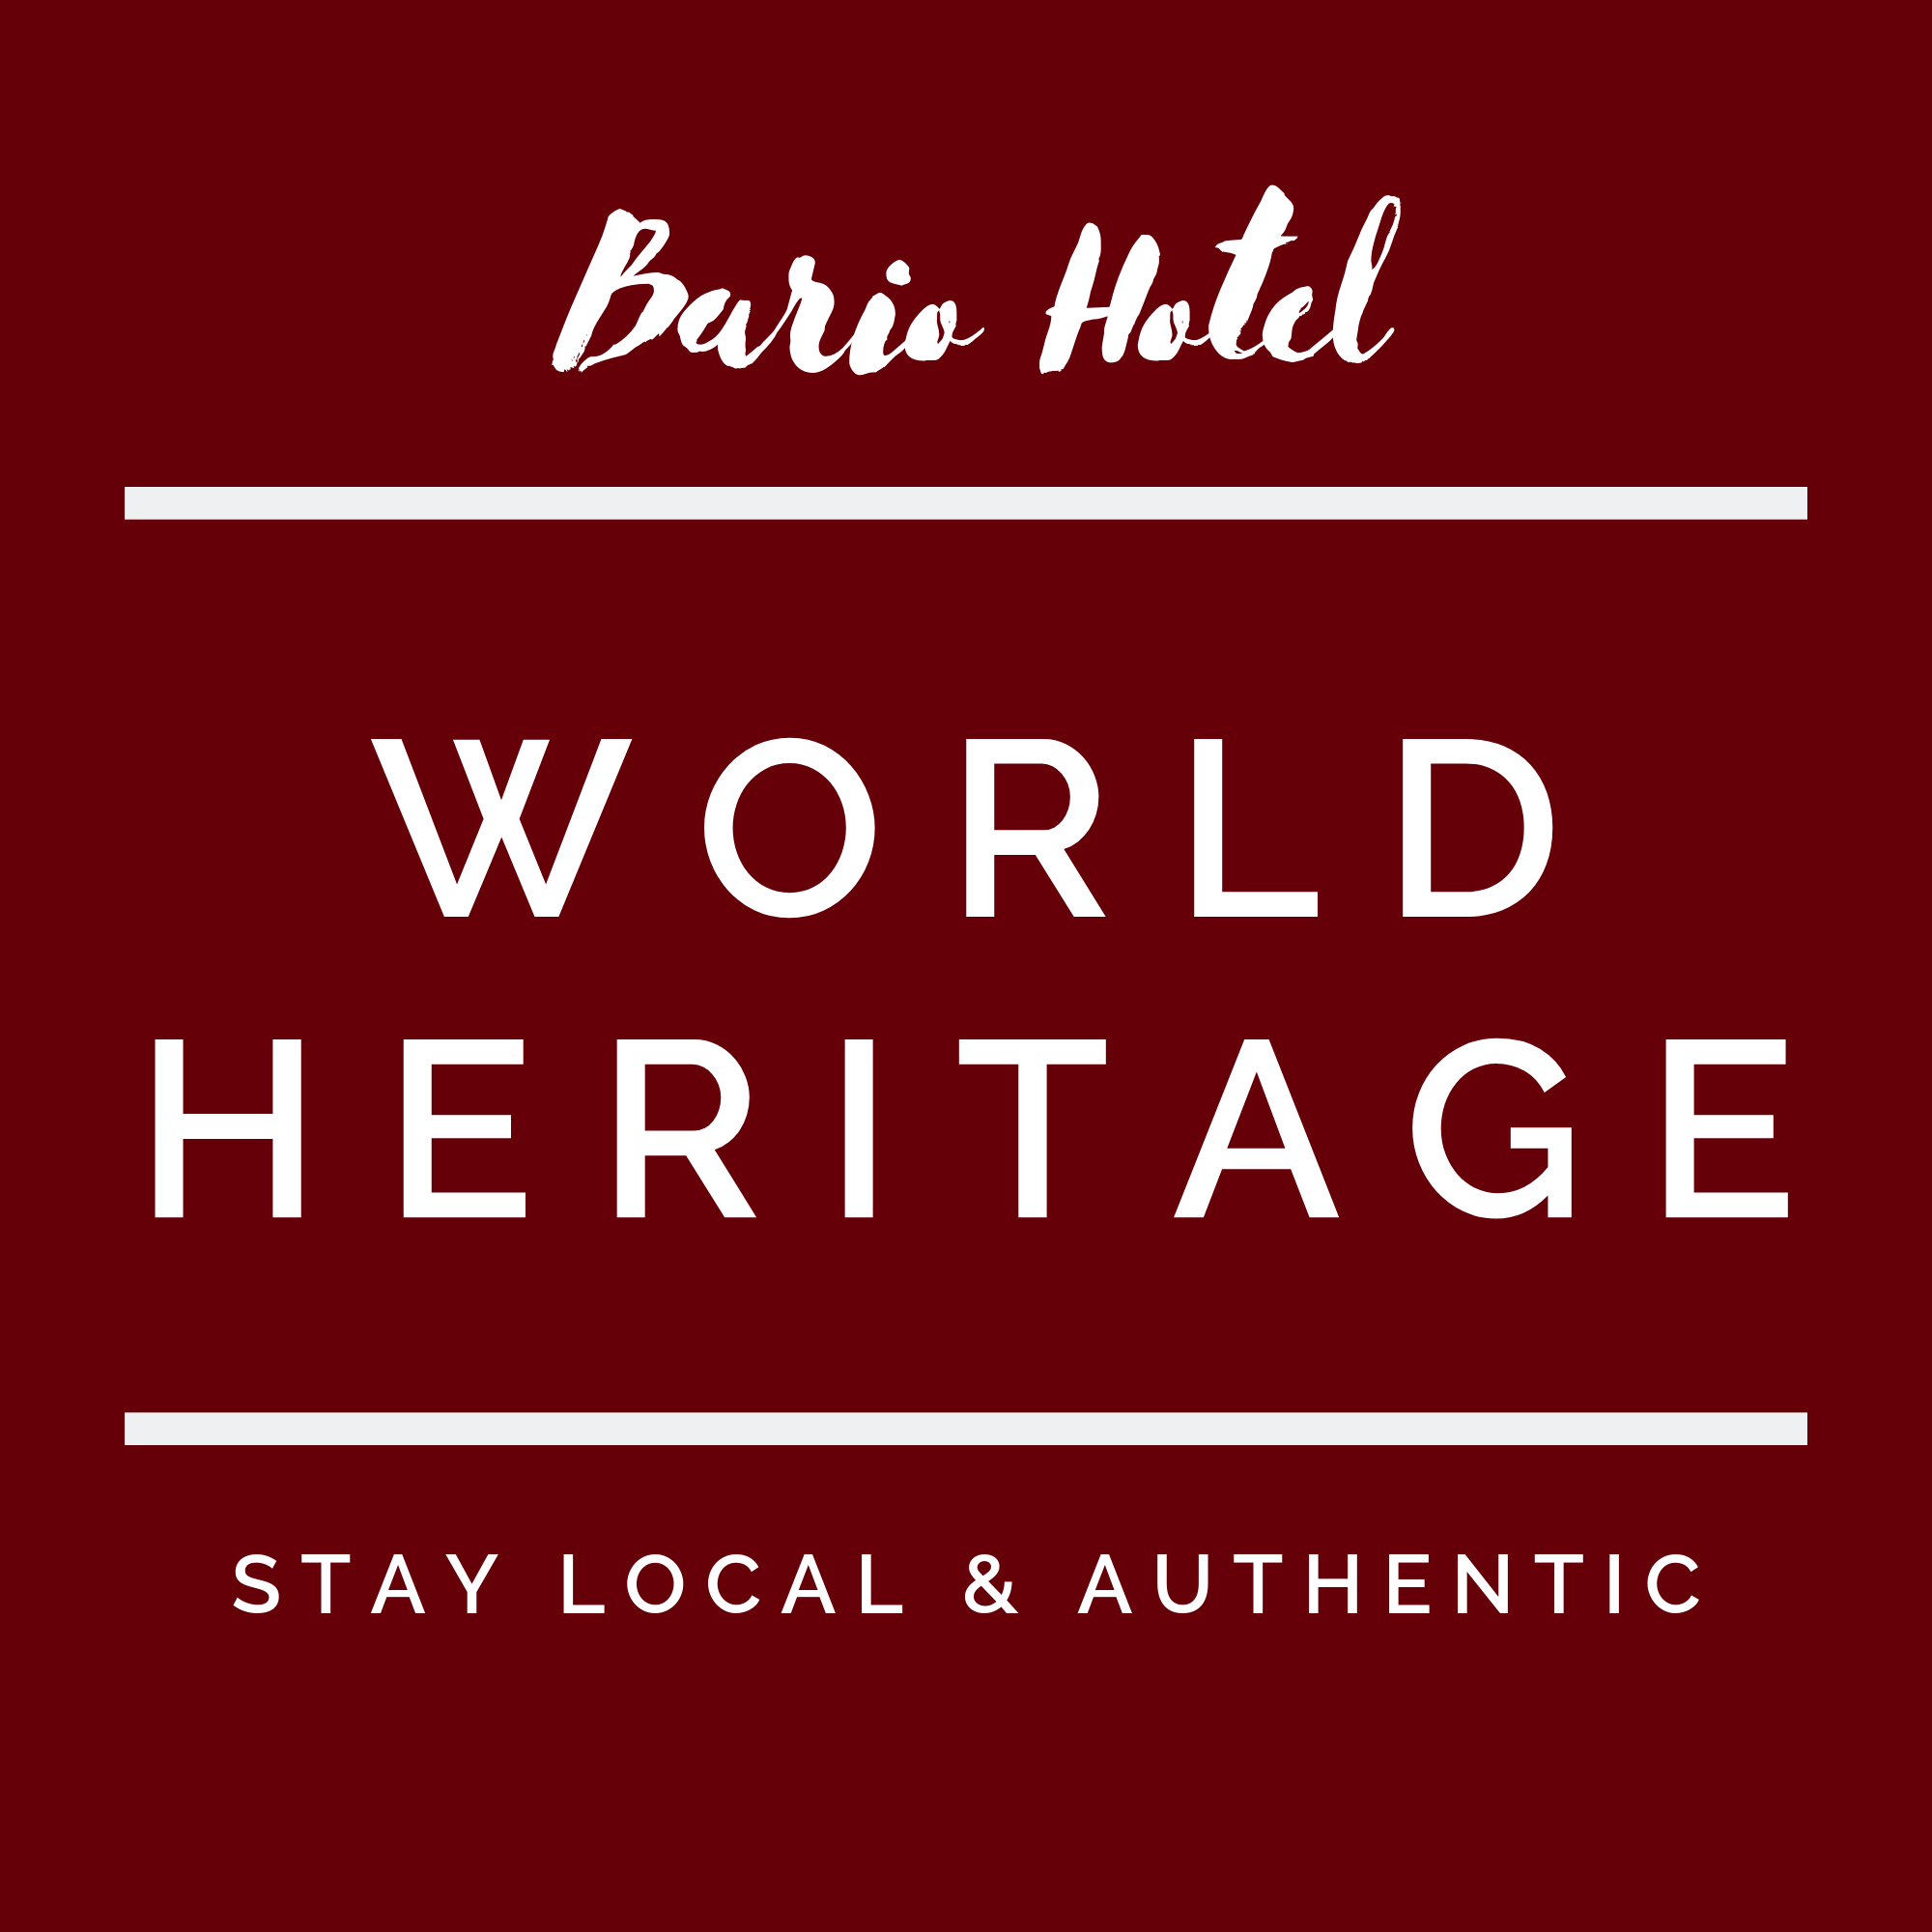 Curaçao Tech Meetups | Bario Hotel | World Heritage | Willemstad, Otrabanda Curaçao - Hoogstraat 16, Willemstad, Curaçao